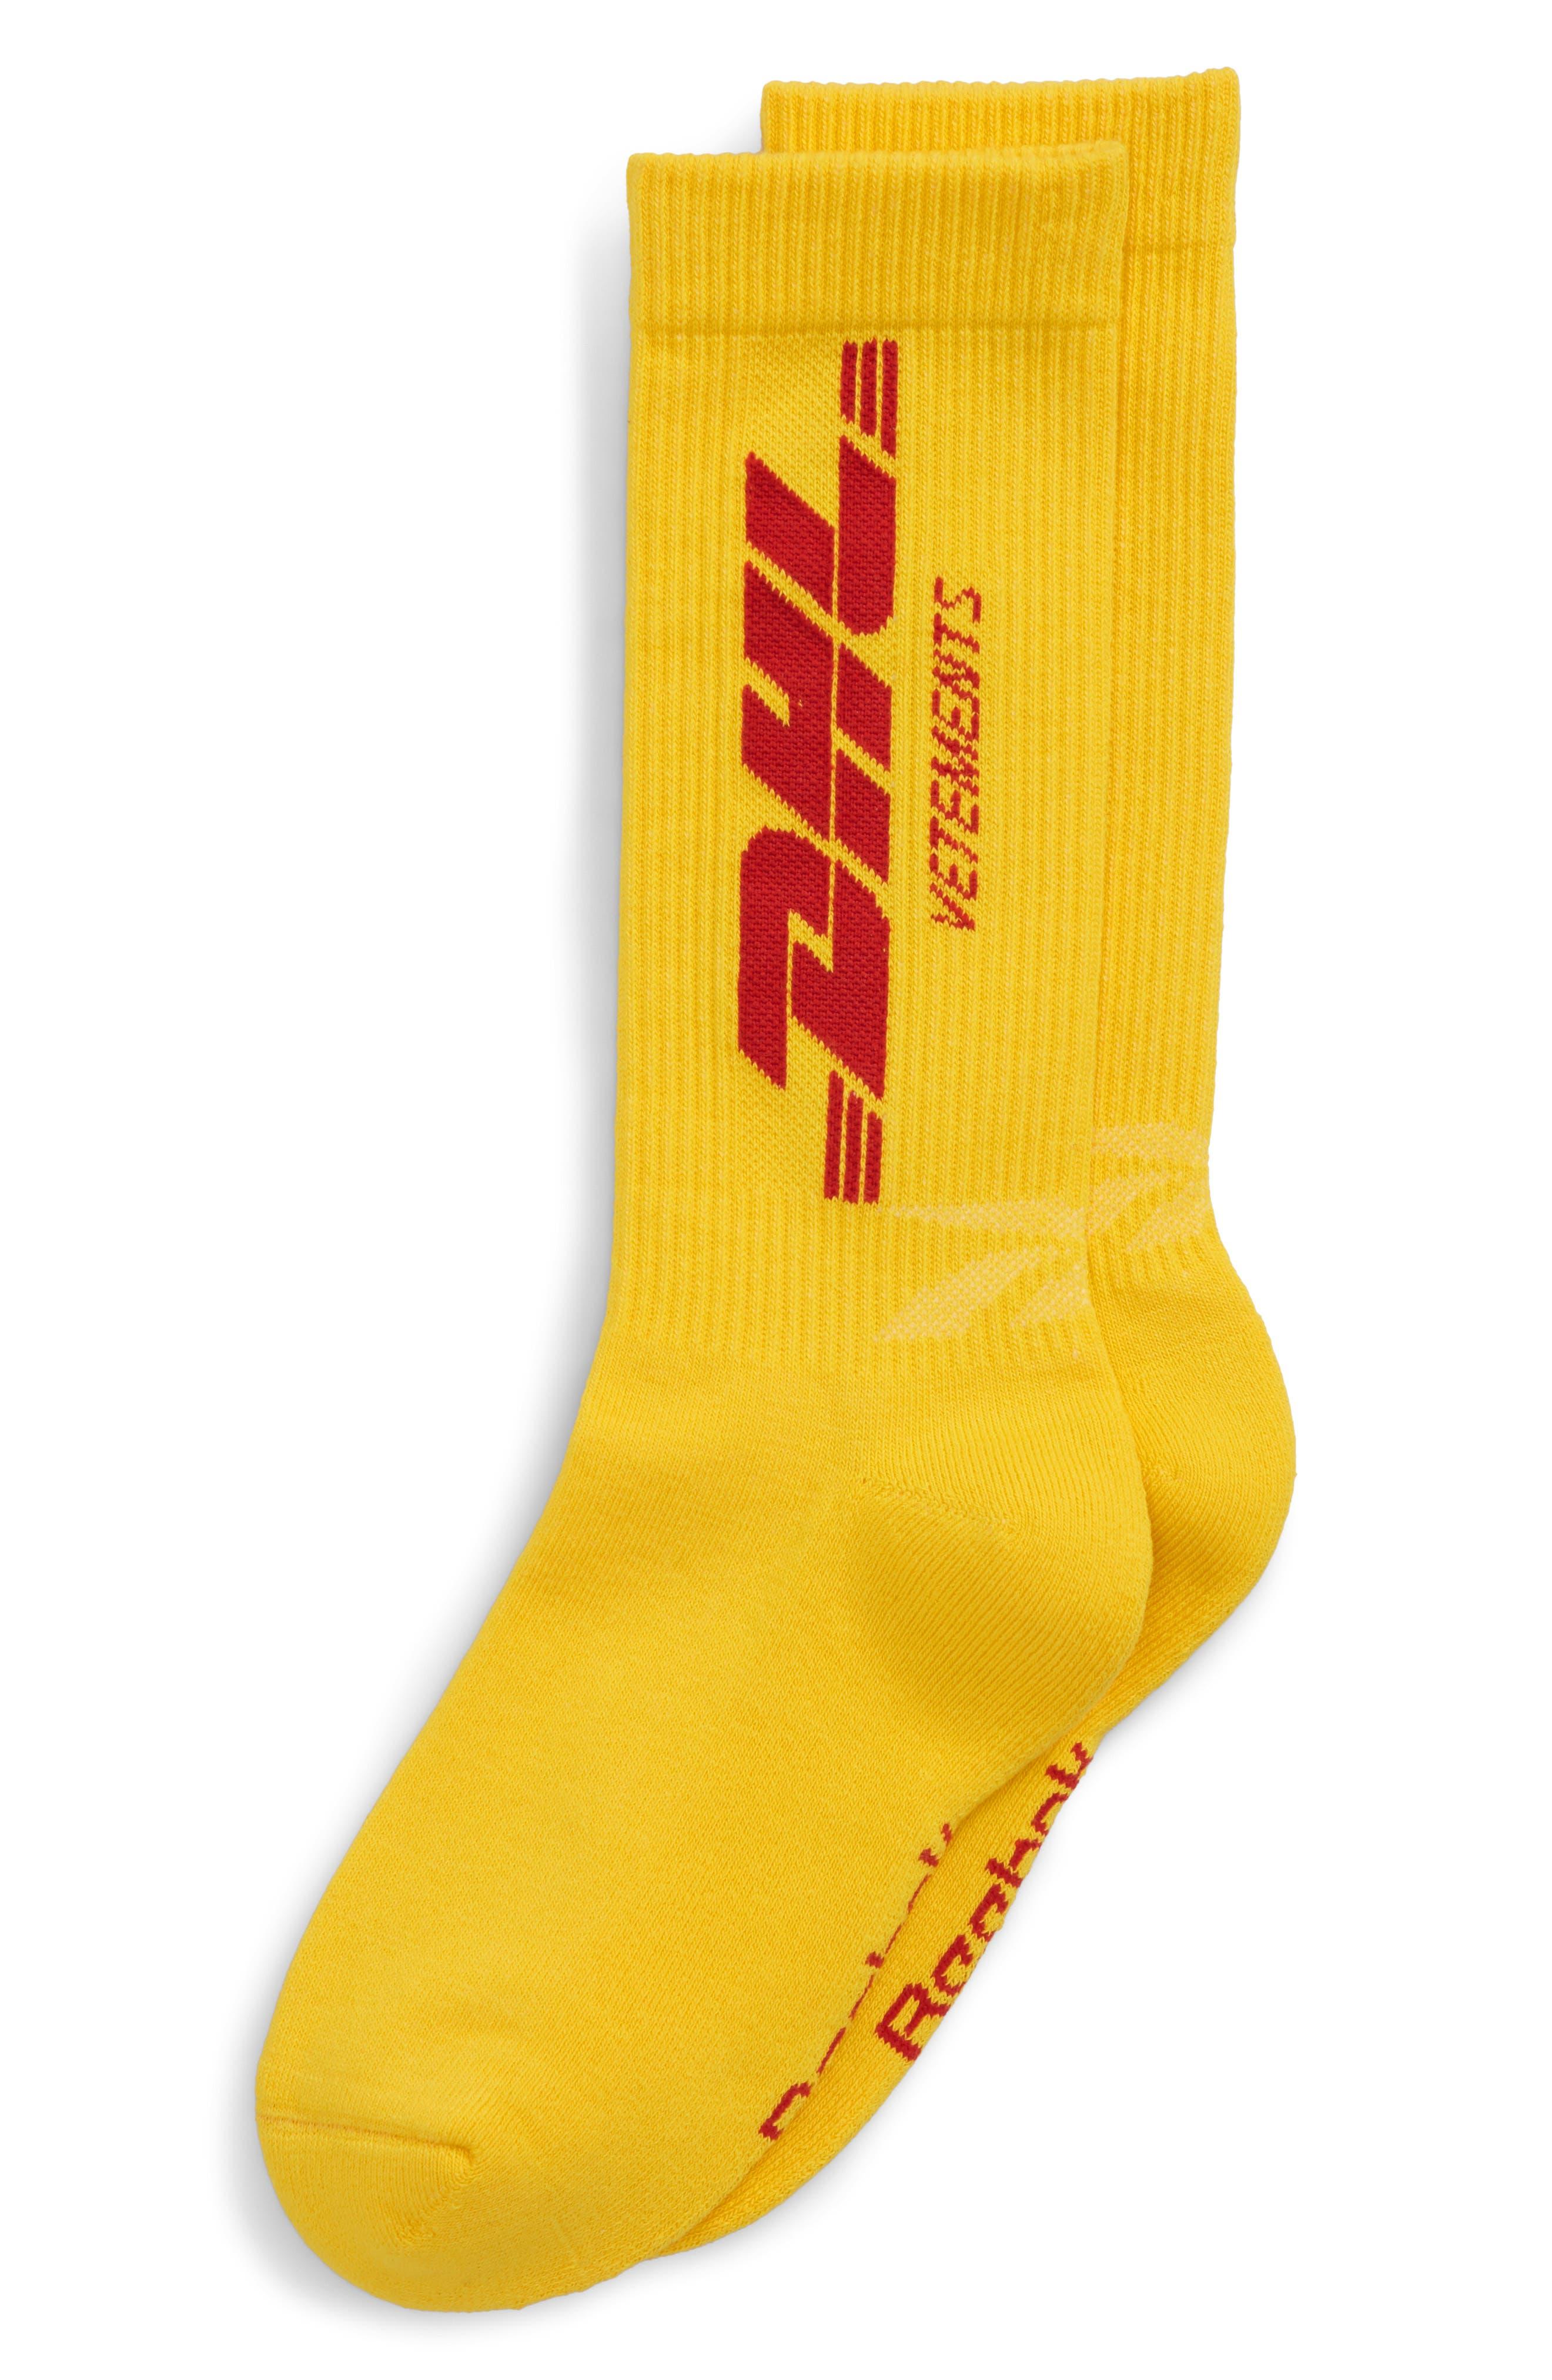 DHL Socks, Main, color, 700